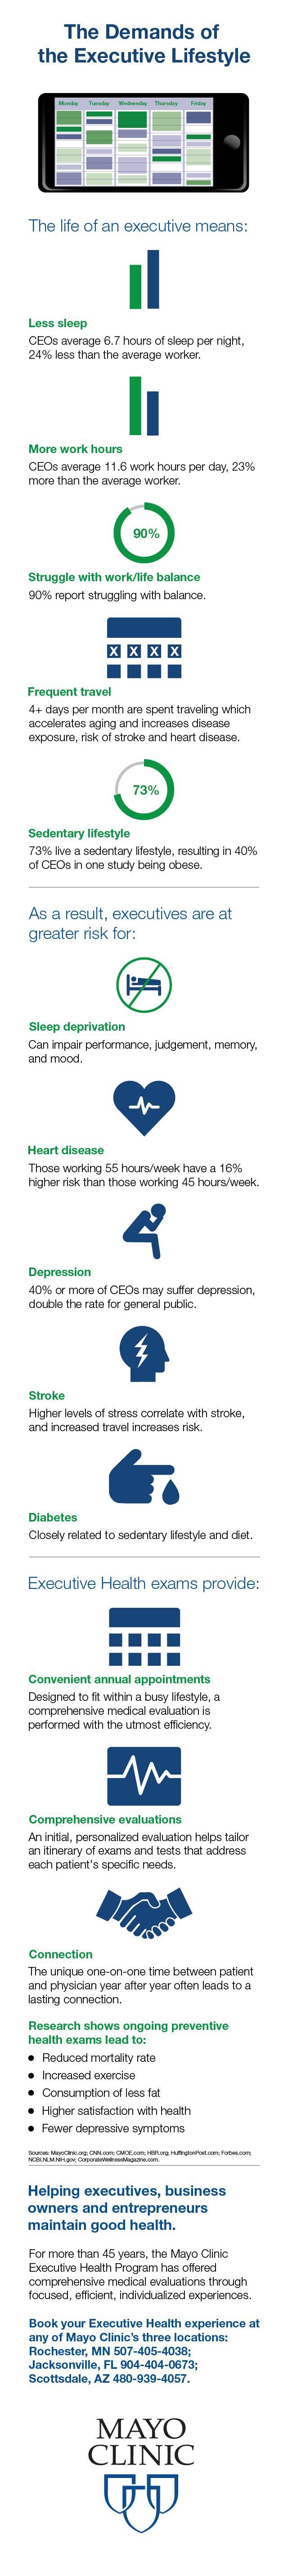 Infographic of executive lifestyle risks like lack of sleep and family balance